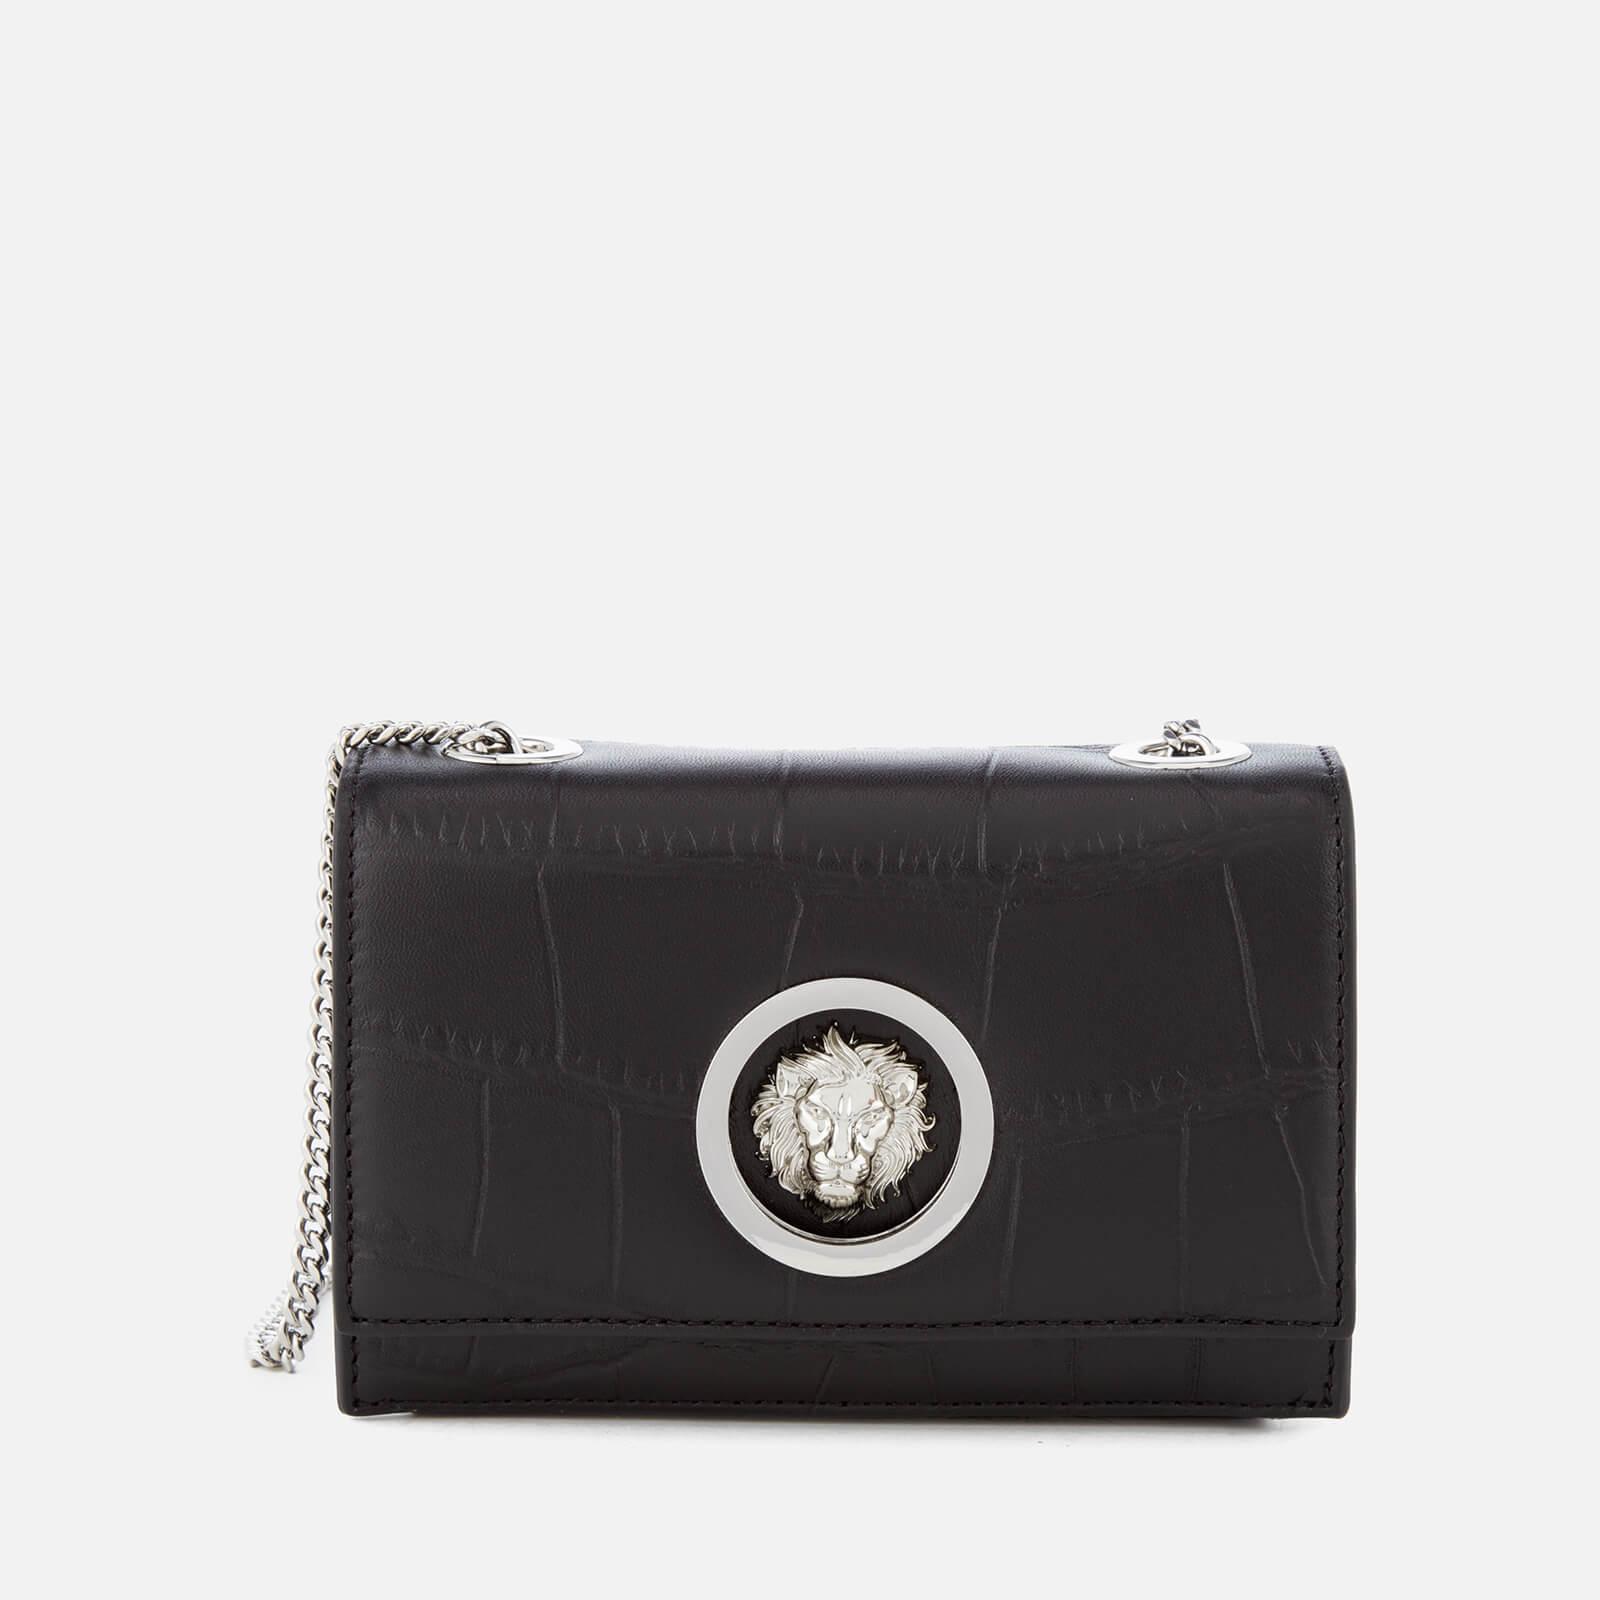 0a5bc4b0b6 Versus Versace Women's Lion Croc Small Clutch Bag - Black